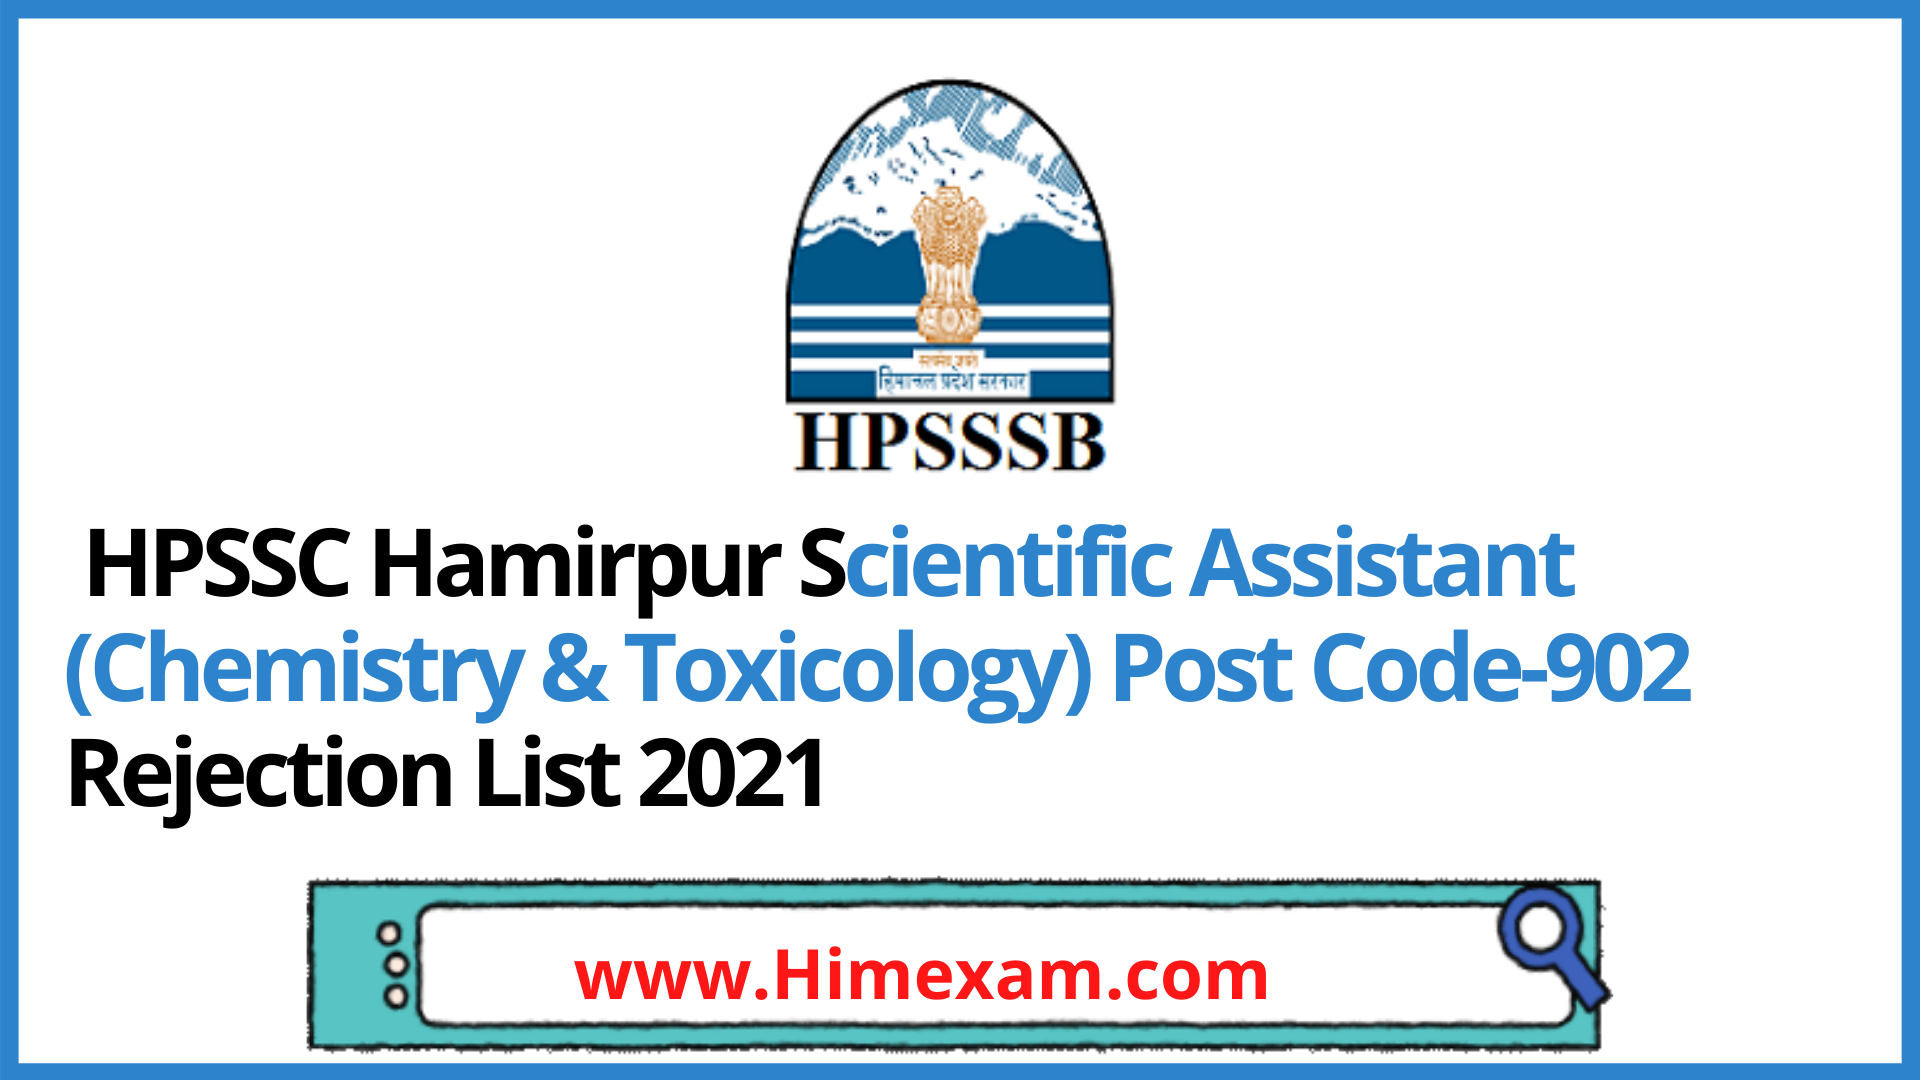 HPSSC Hamirpur Scientific Assistant (Chemistry & Toxicology) Post Code-902 Rejection List 2021